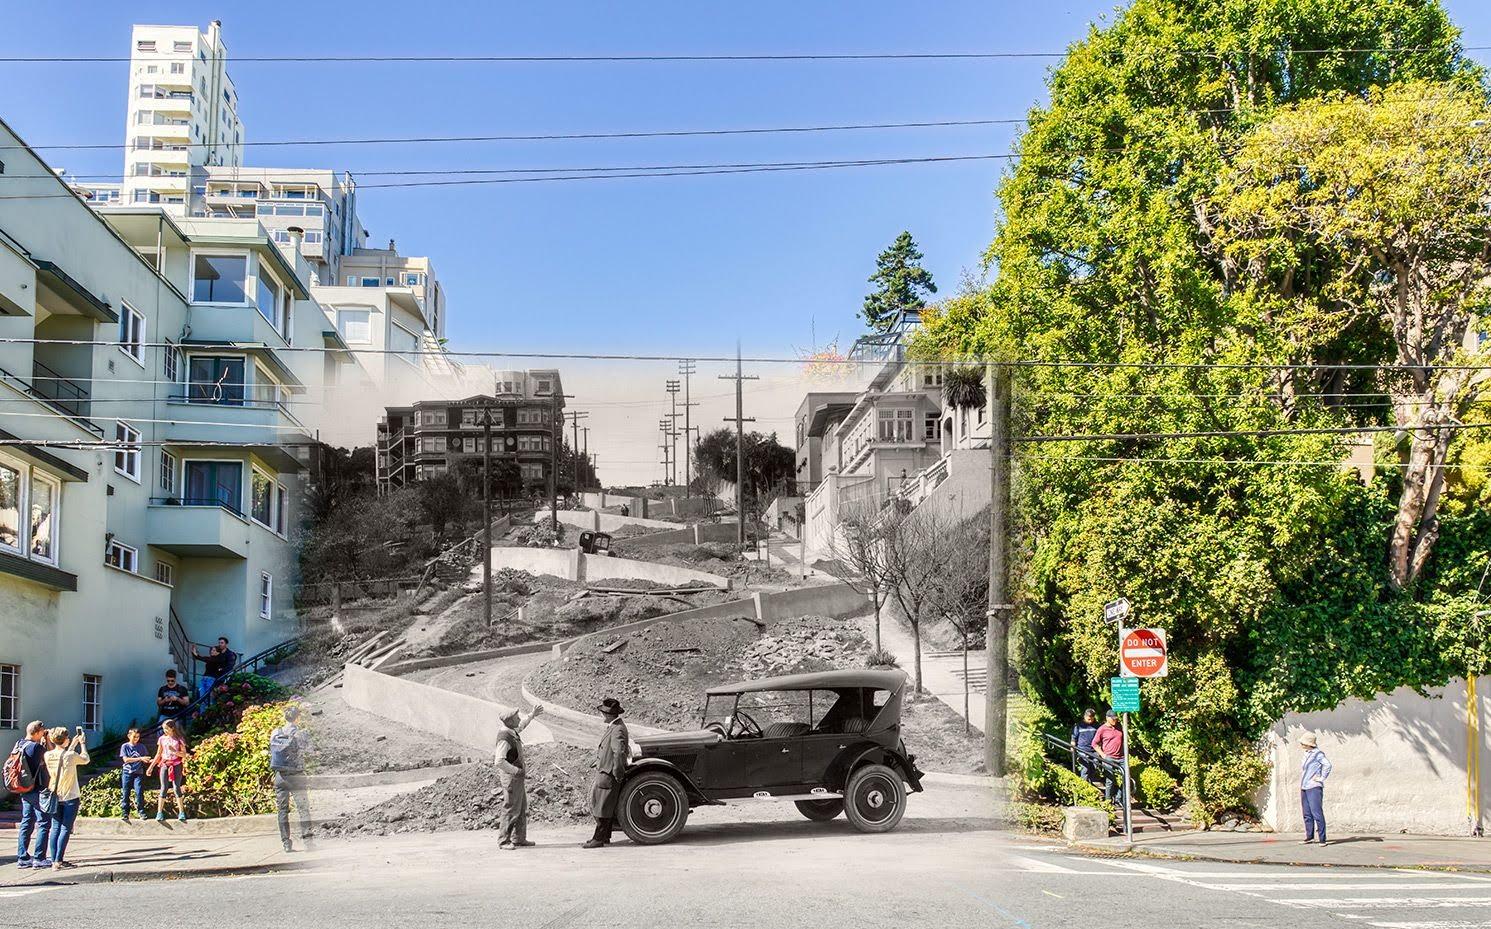 San Francisco history cover image